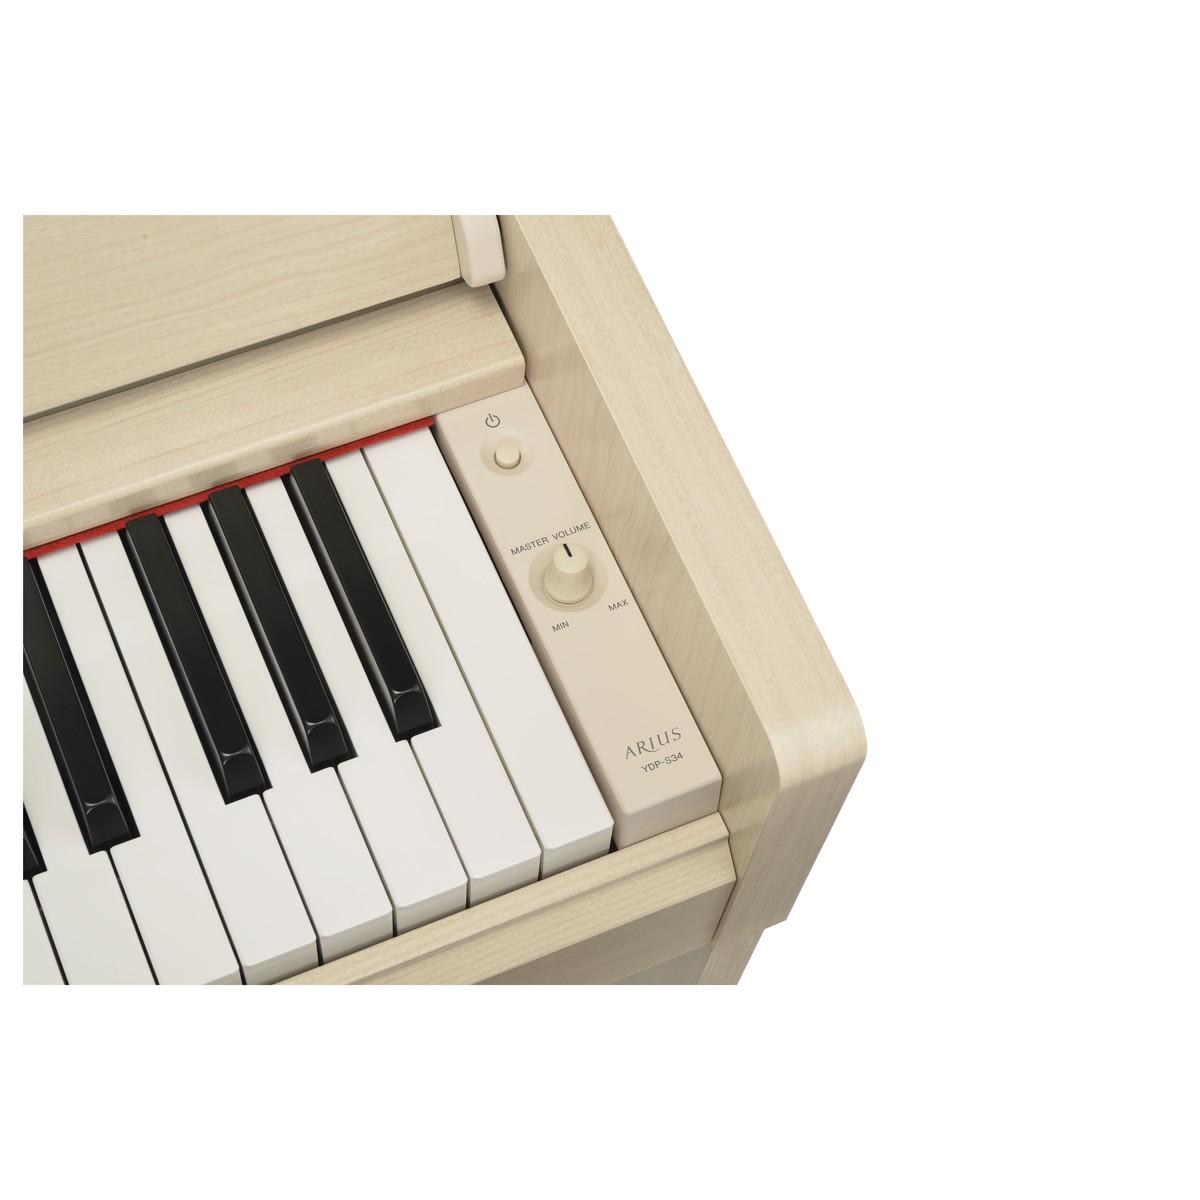 YAMAHA ARIUS YDP-S34 WA PIANOFORTE DIGITALE 88 TASTI PESATI COLORE BIANCO CENERE 4